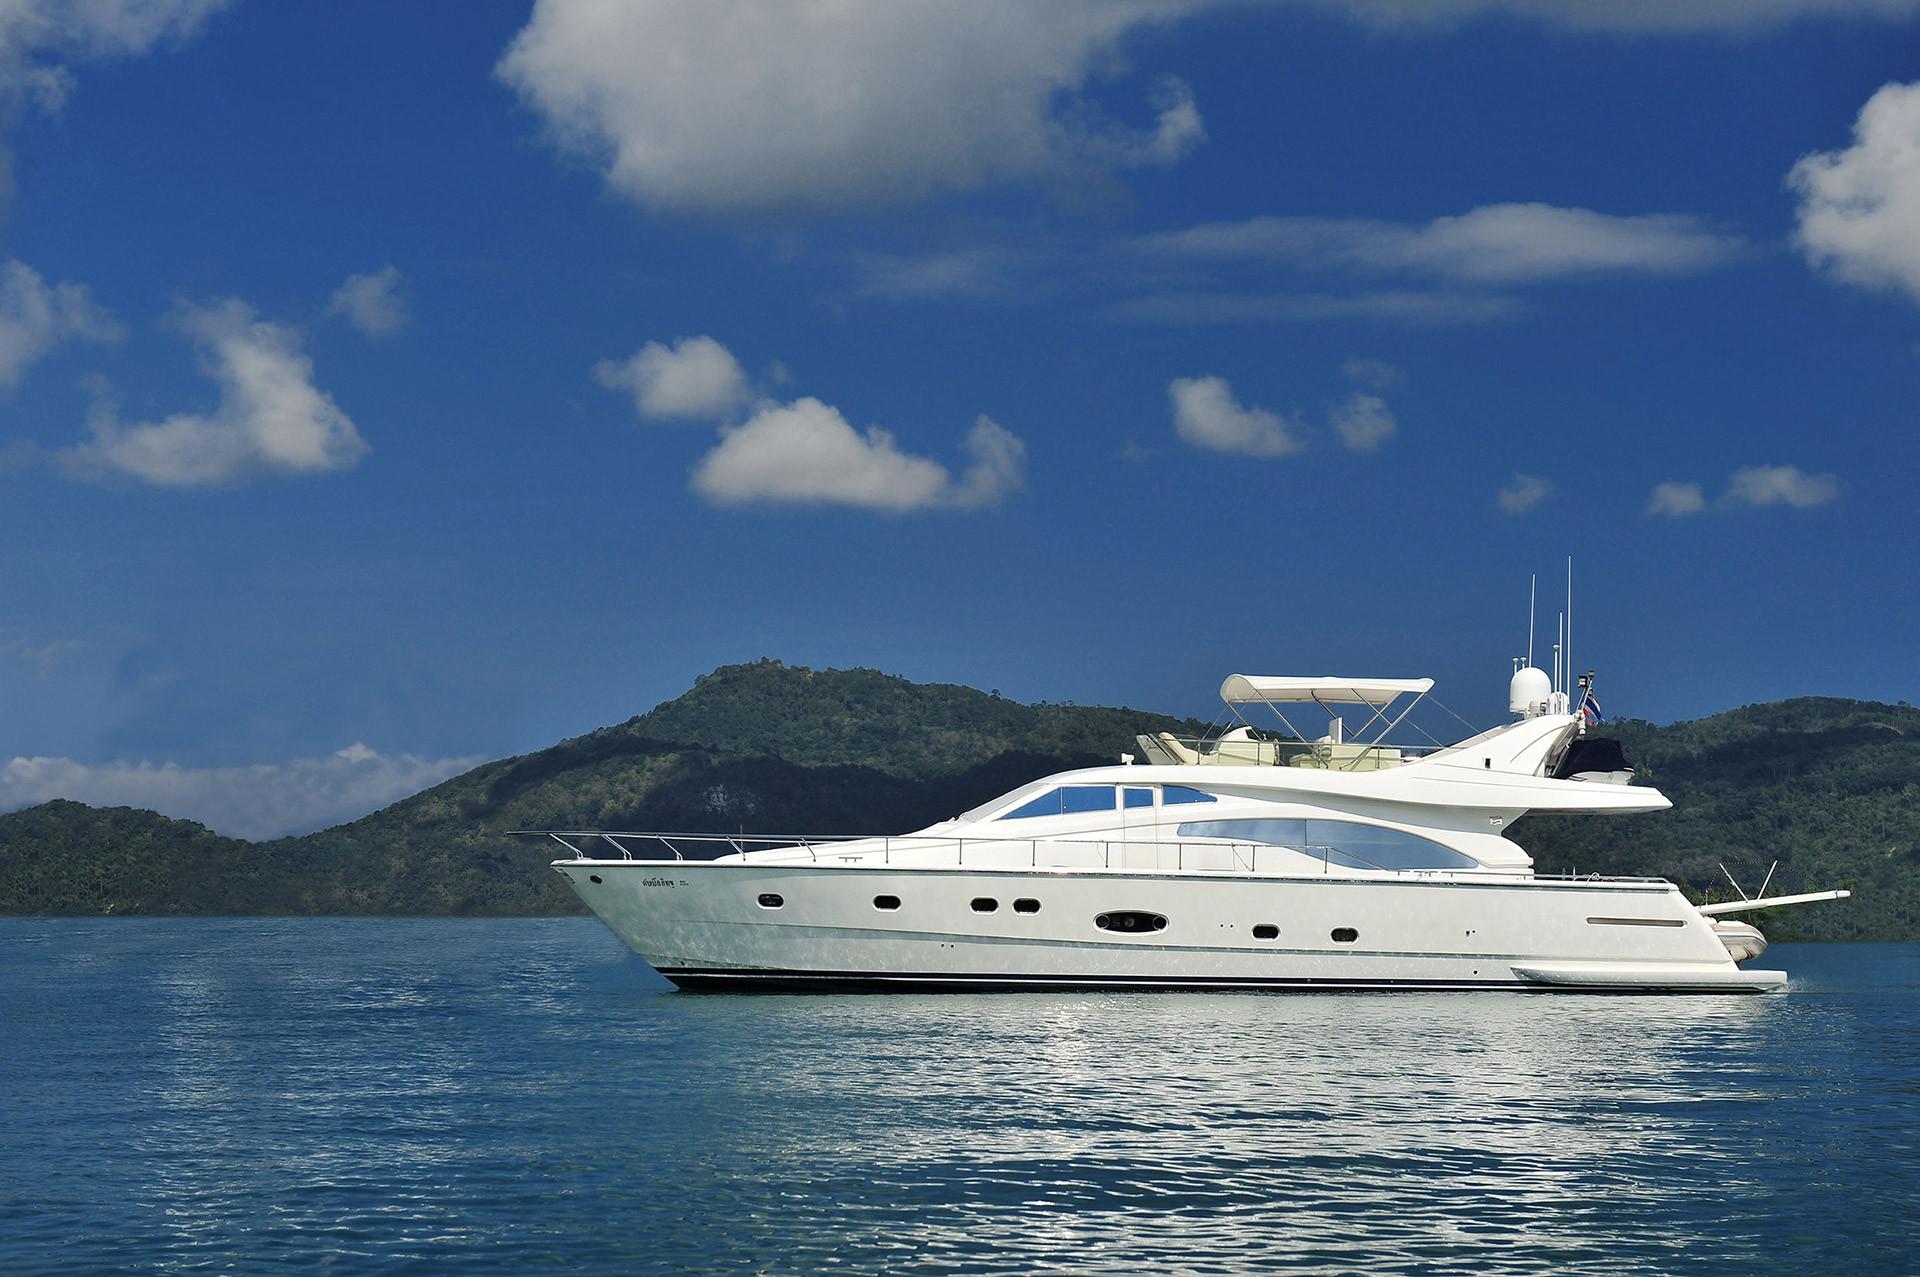 Wahoo Phuket Boat & Yacht Charter